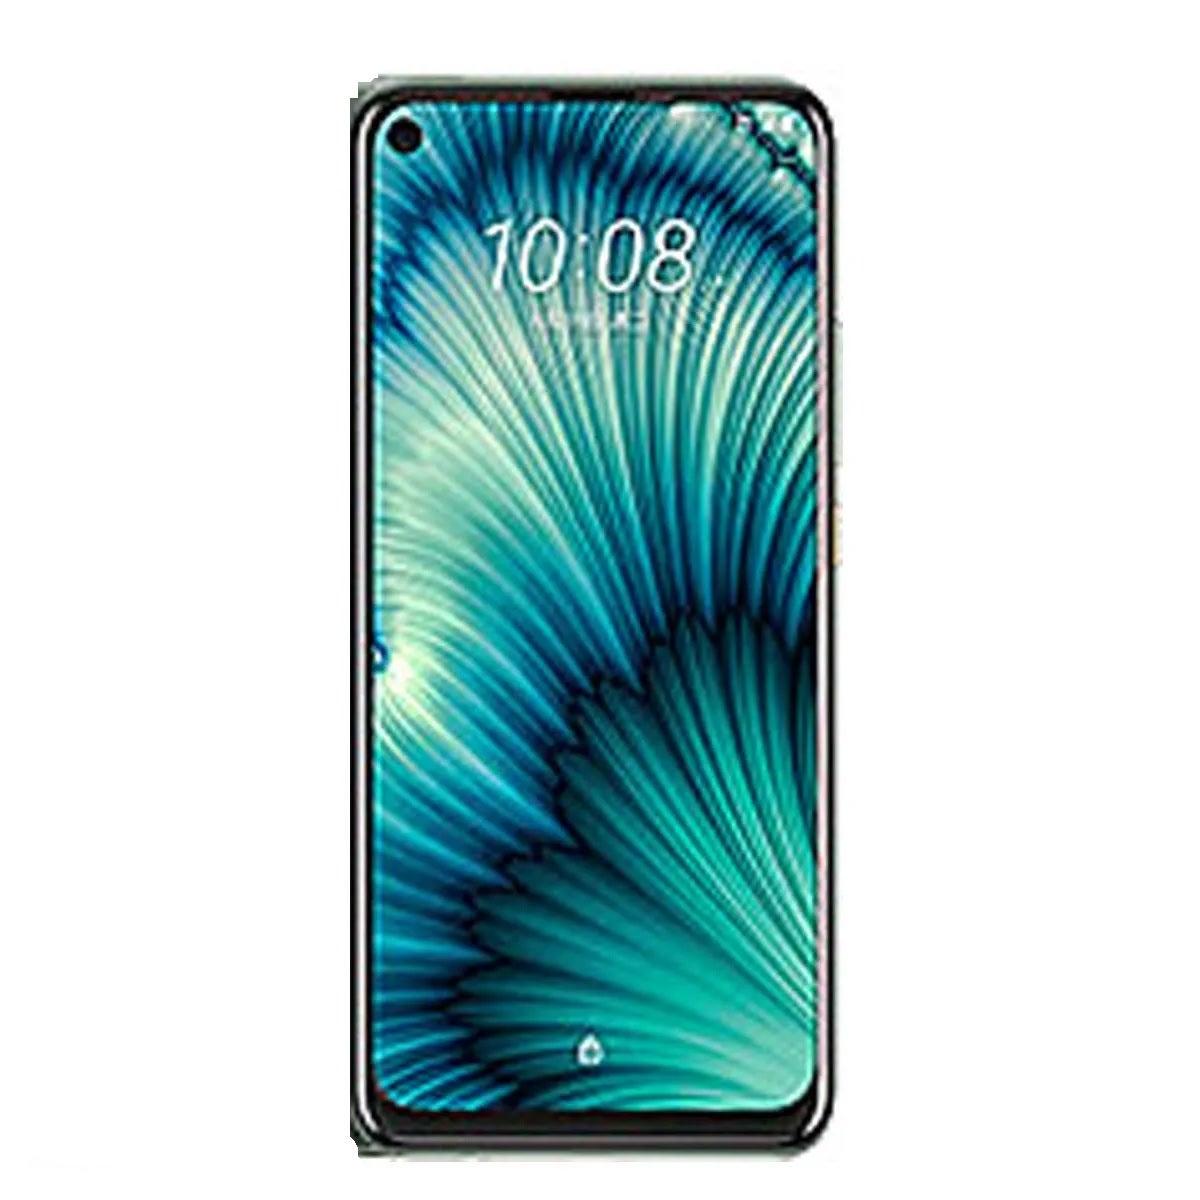 HTC U20 5G Mobile Phone